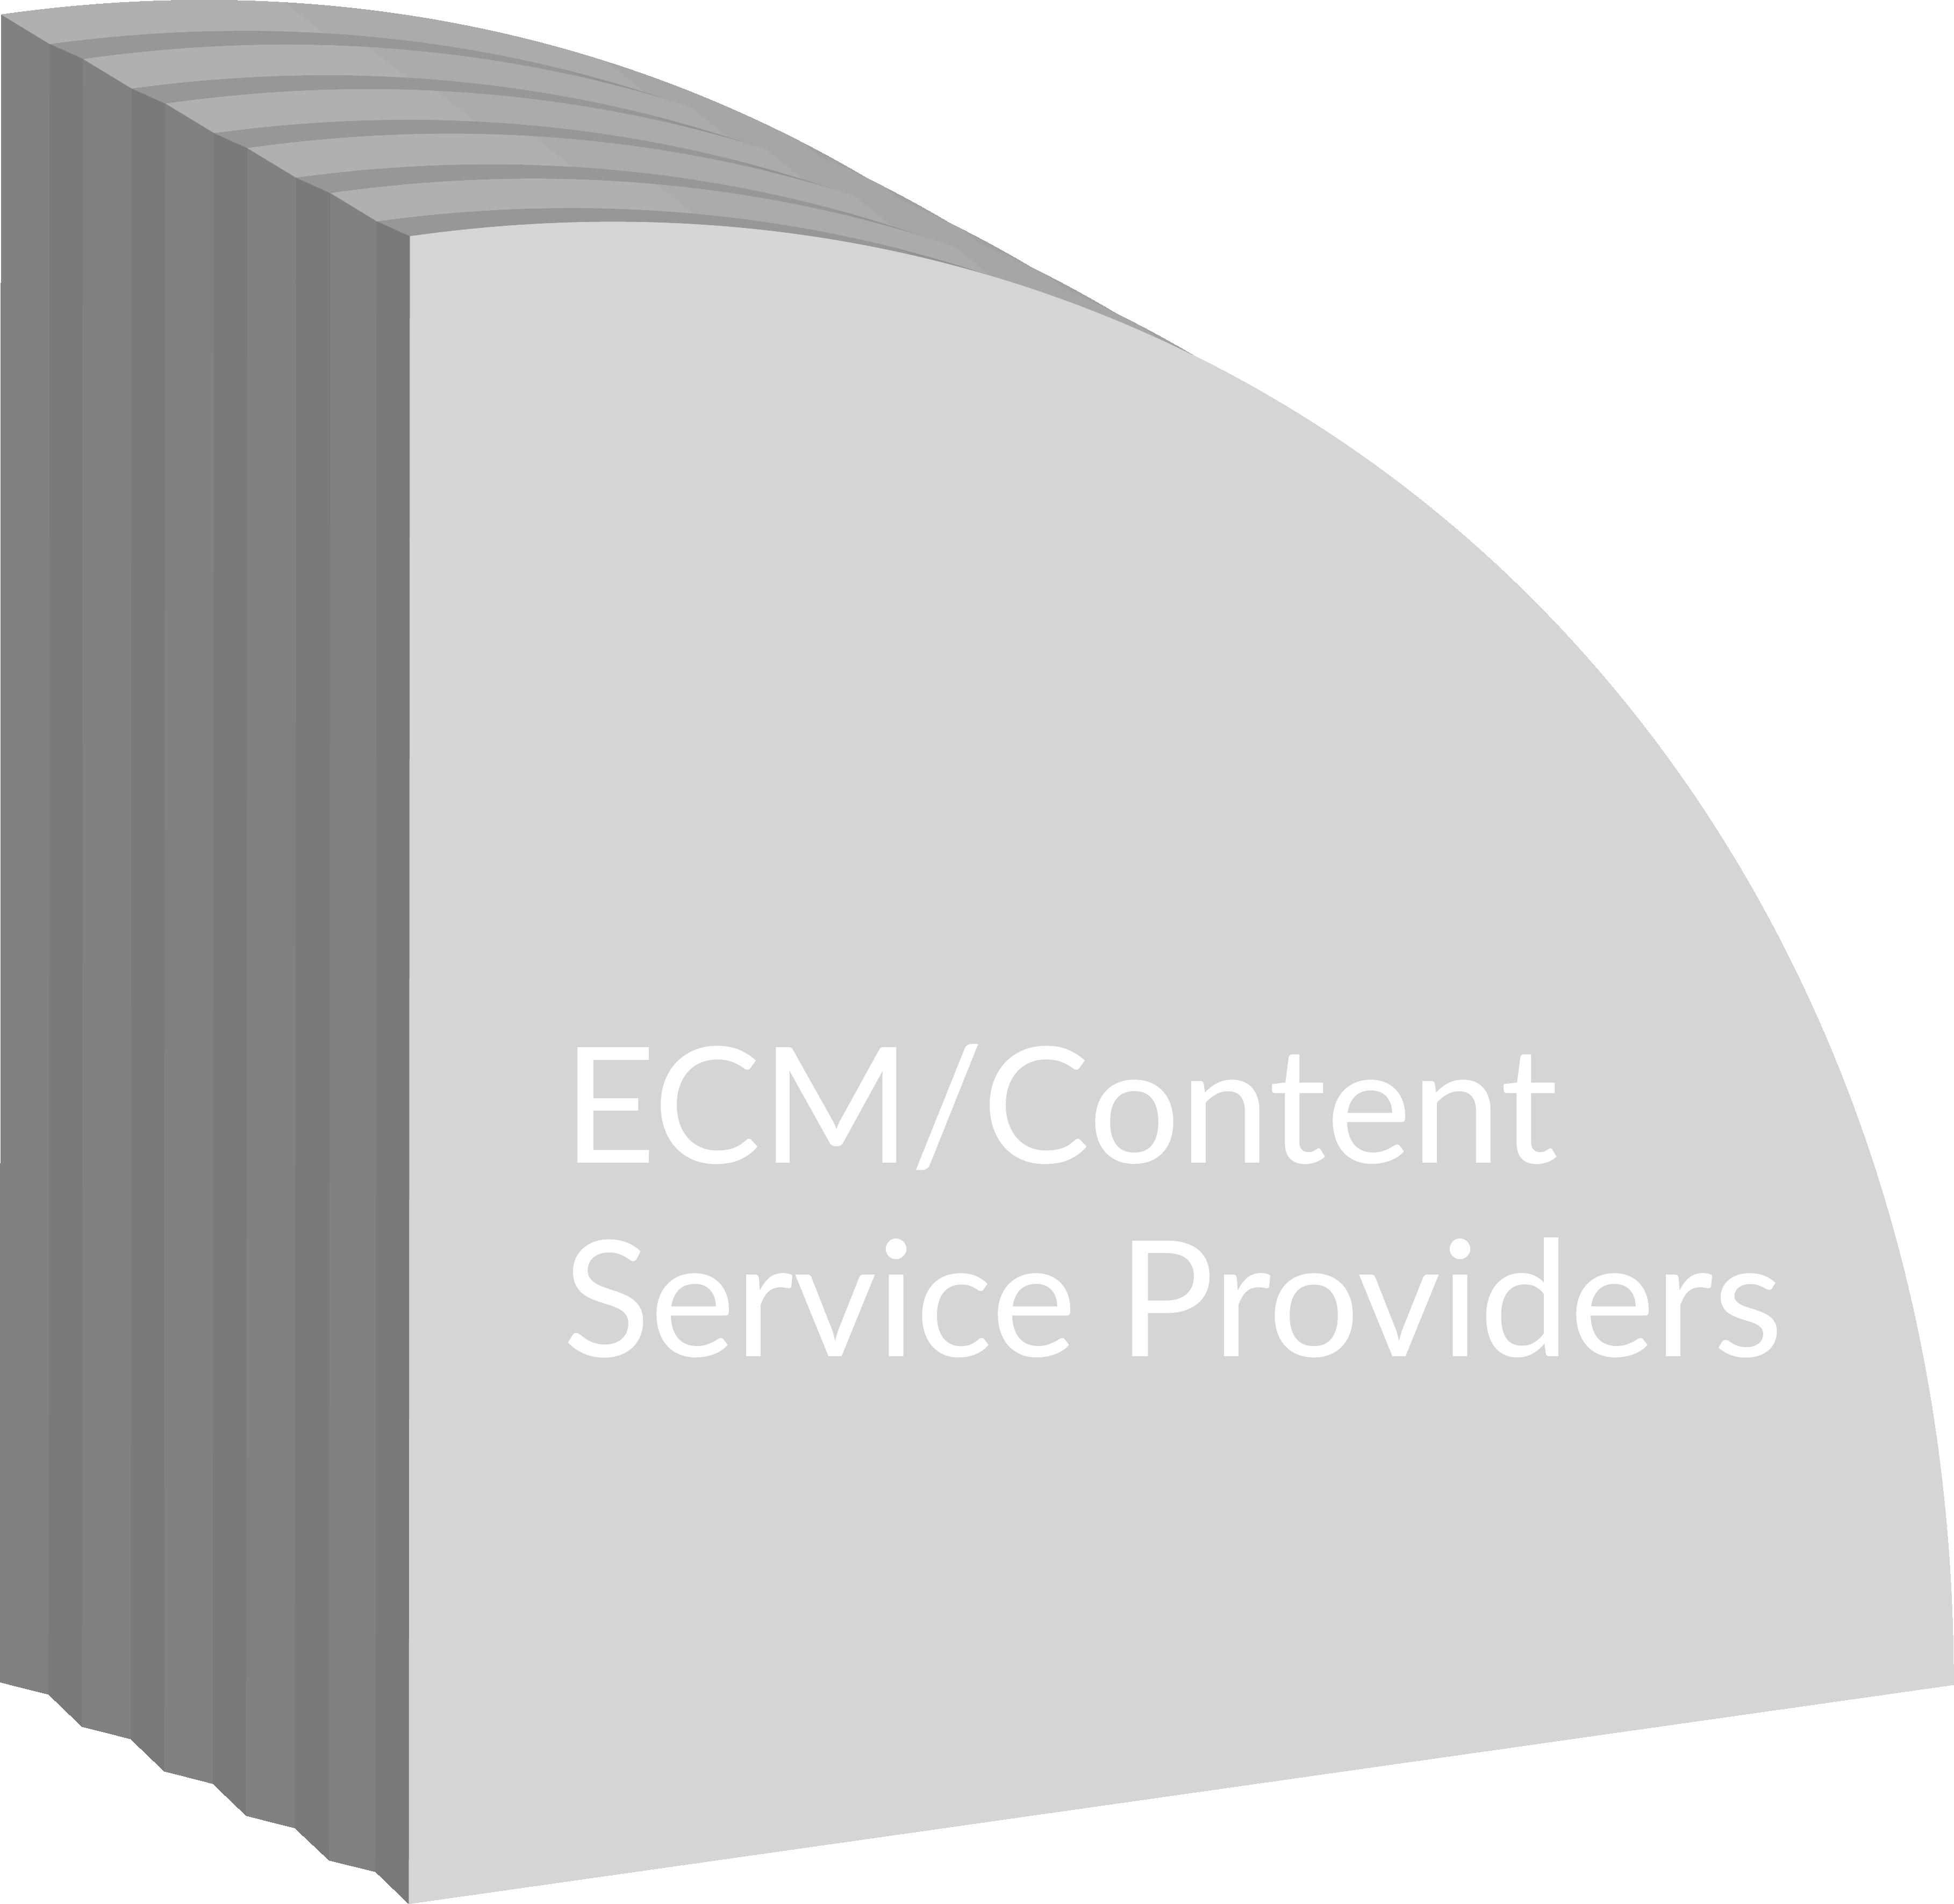 ECM/Content Service Providers slice